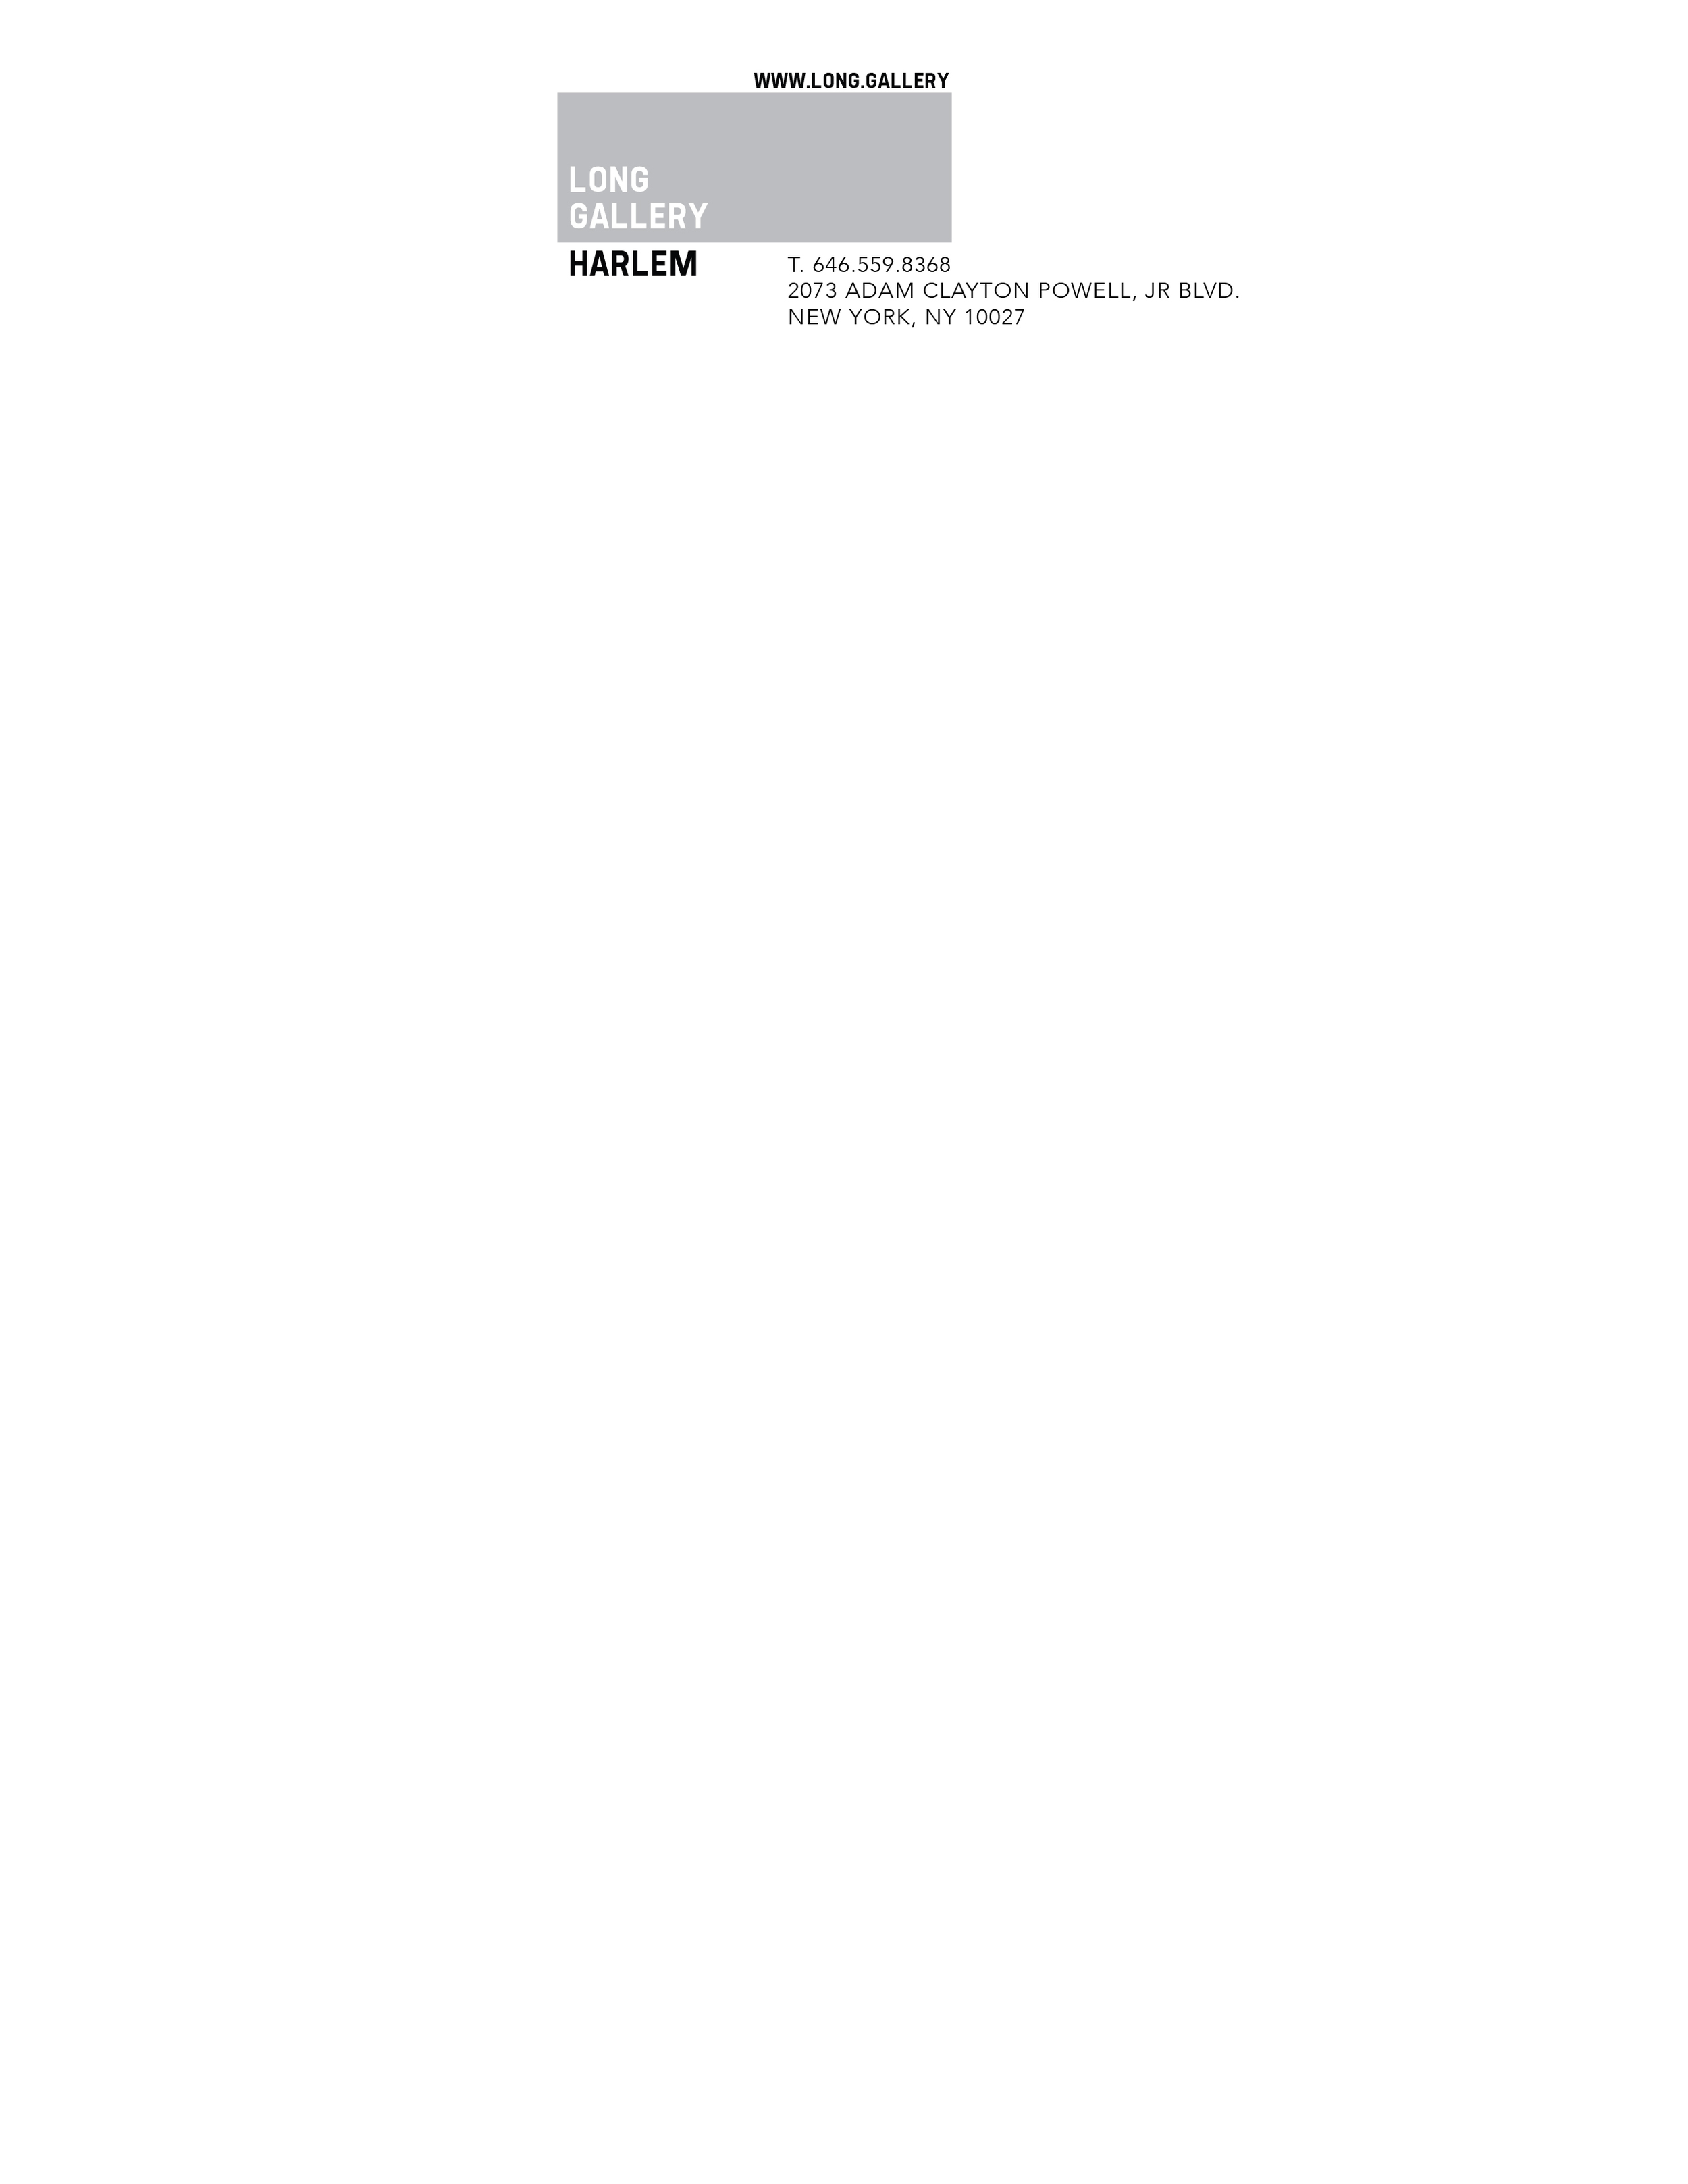 LetterHead -03.jpg